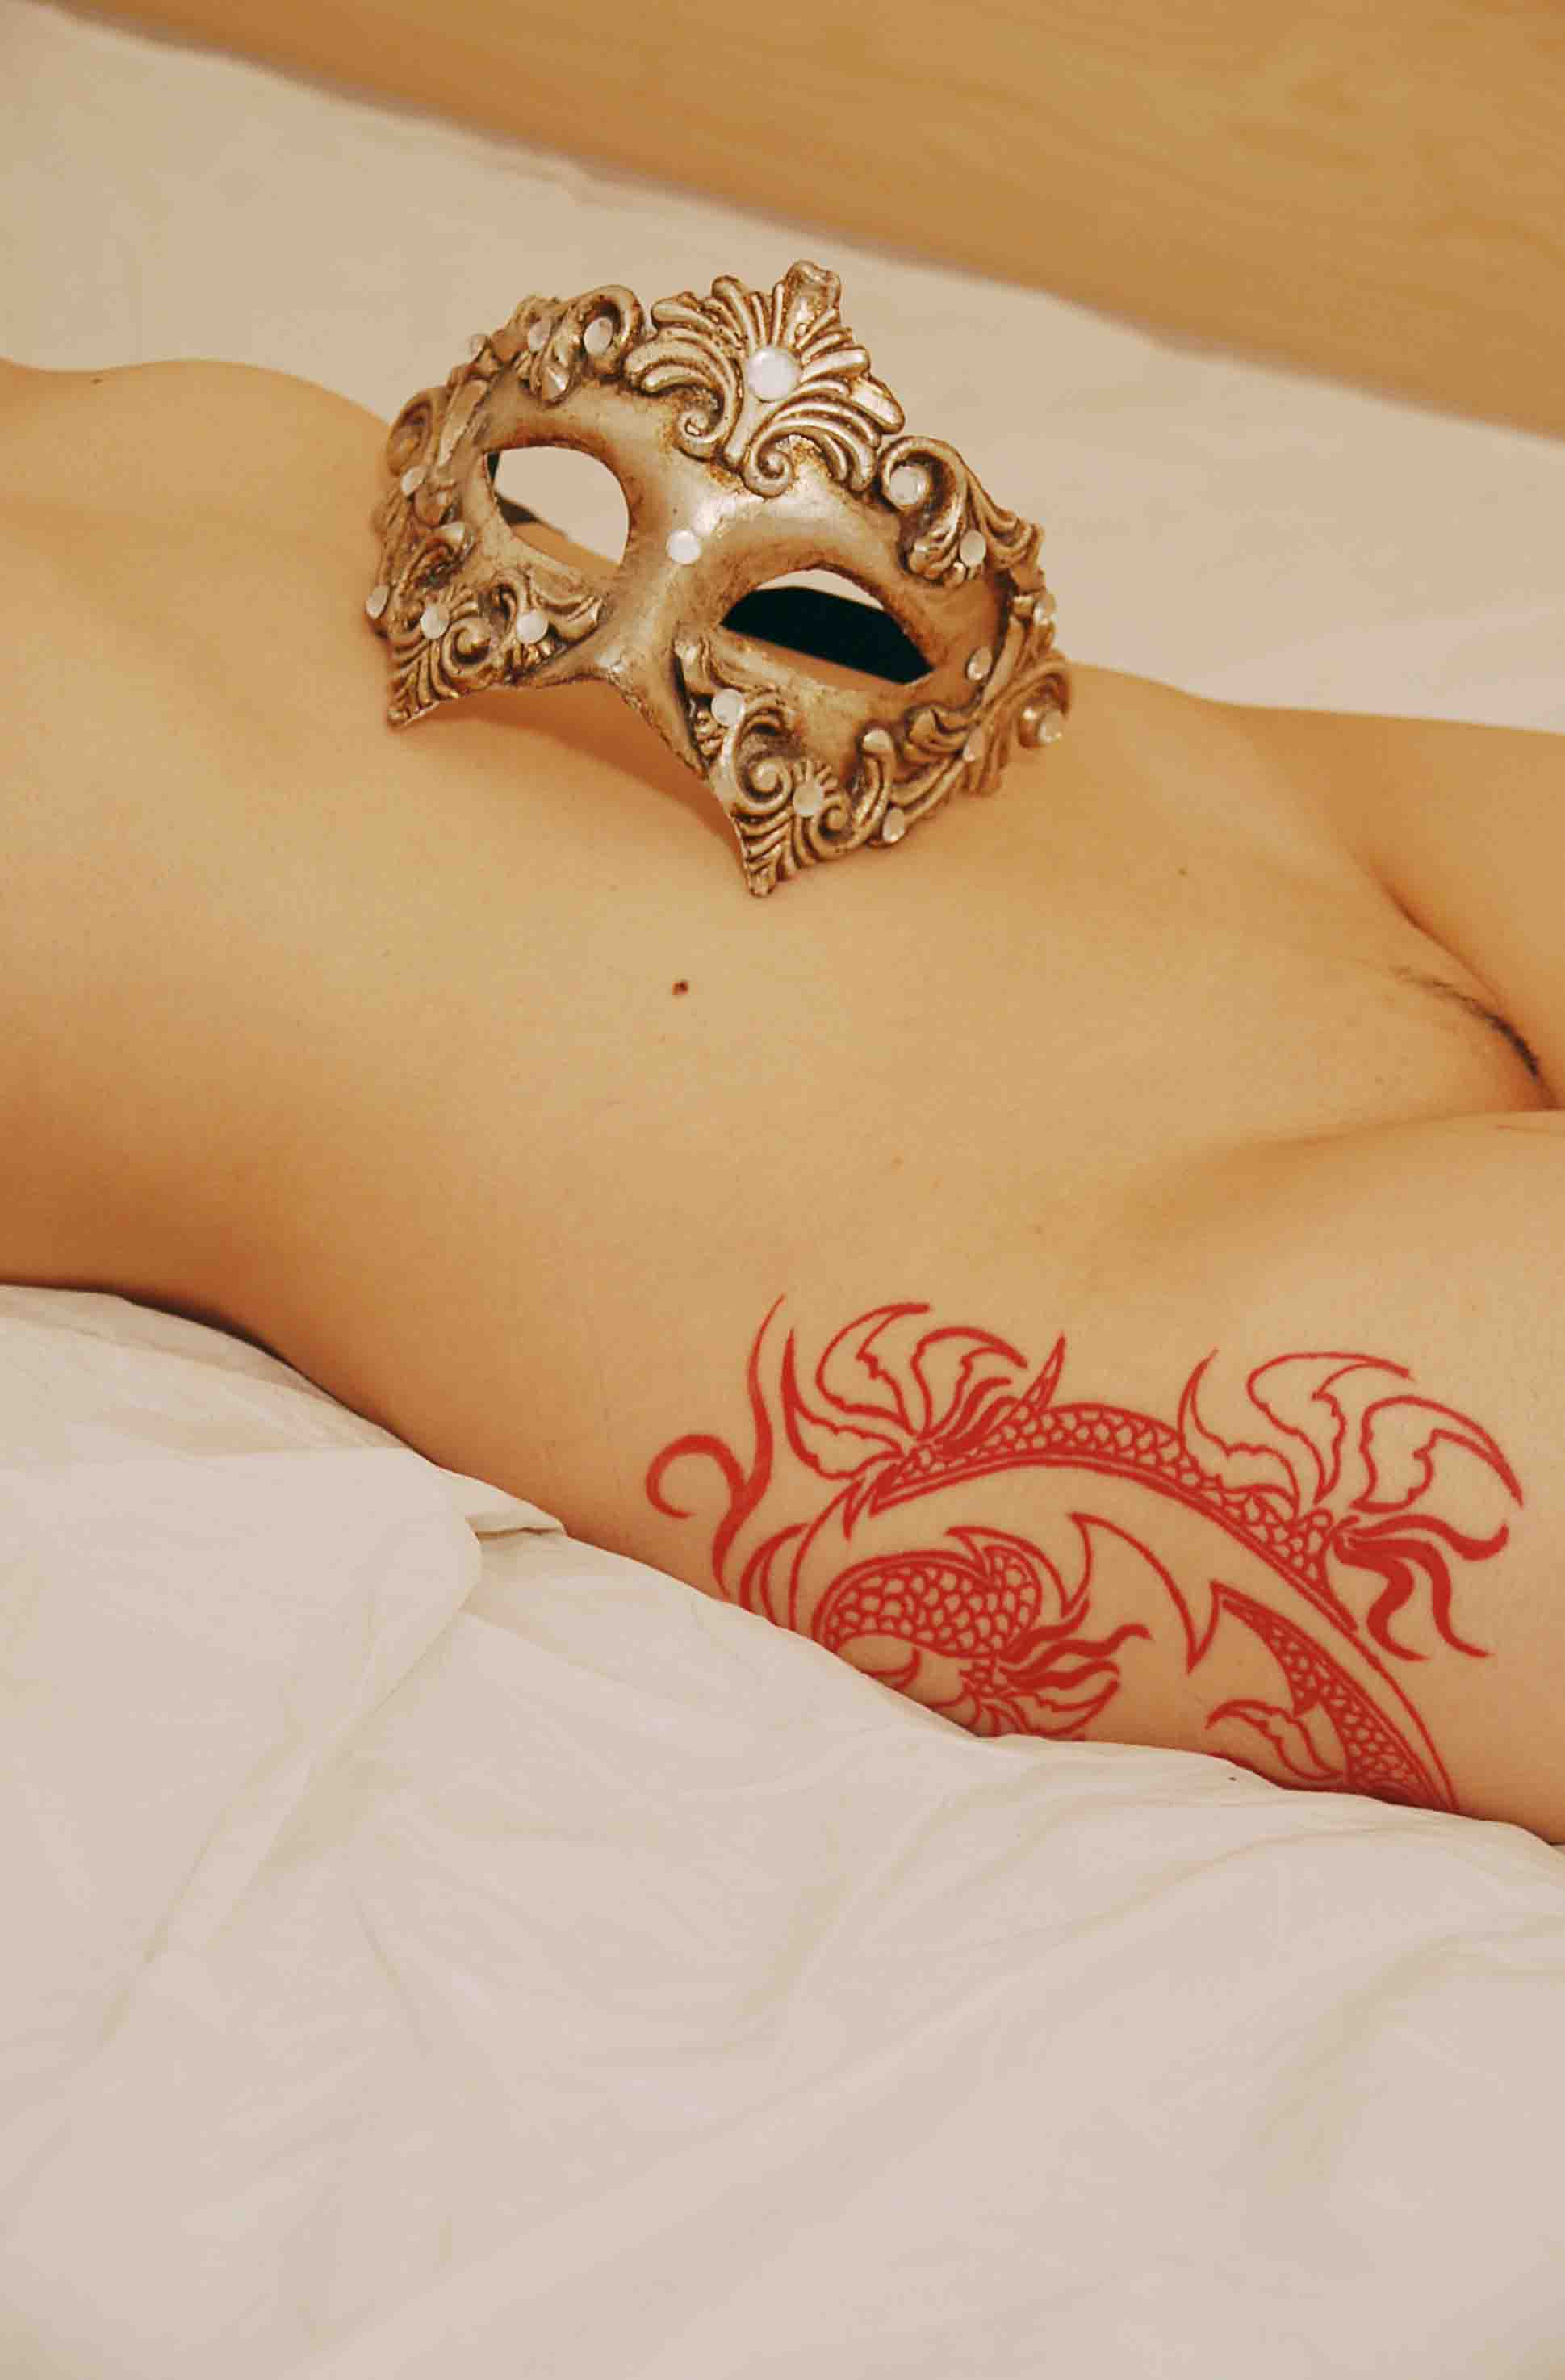 Miah Vu & Her Venice Mask, 2008